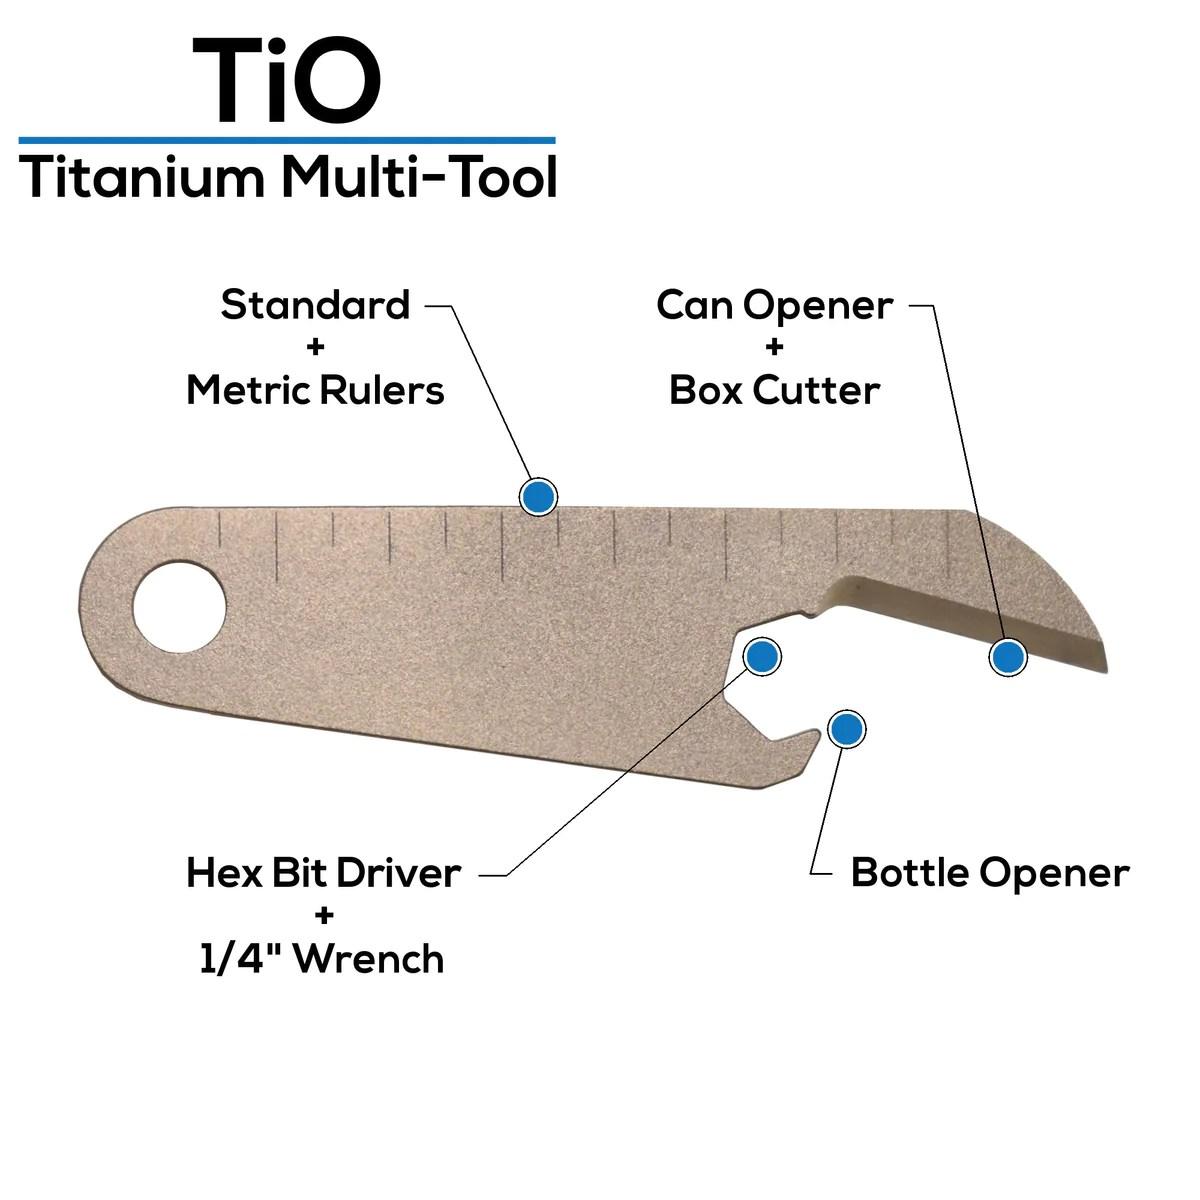 hight resolution of  washing bottle opener diagram wiring diagram on clothes dryer schematic toaster schematic washing machine